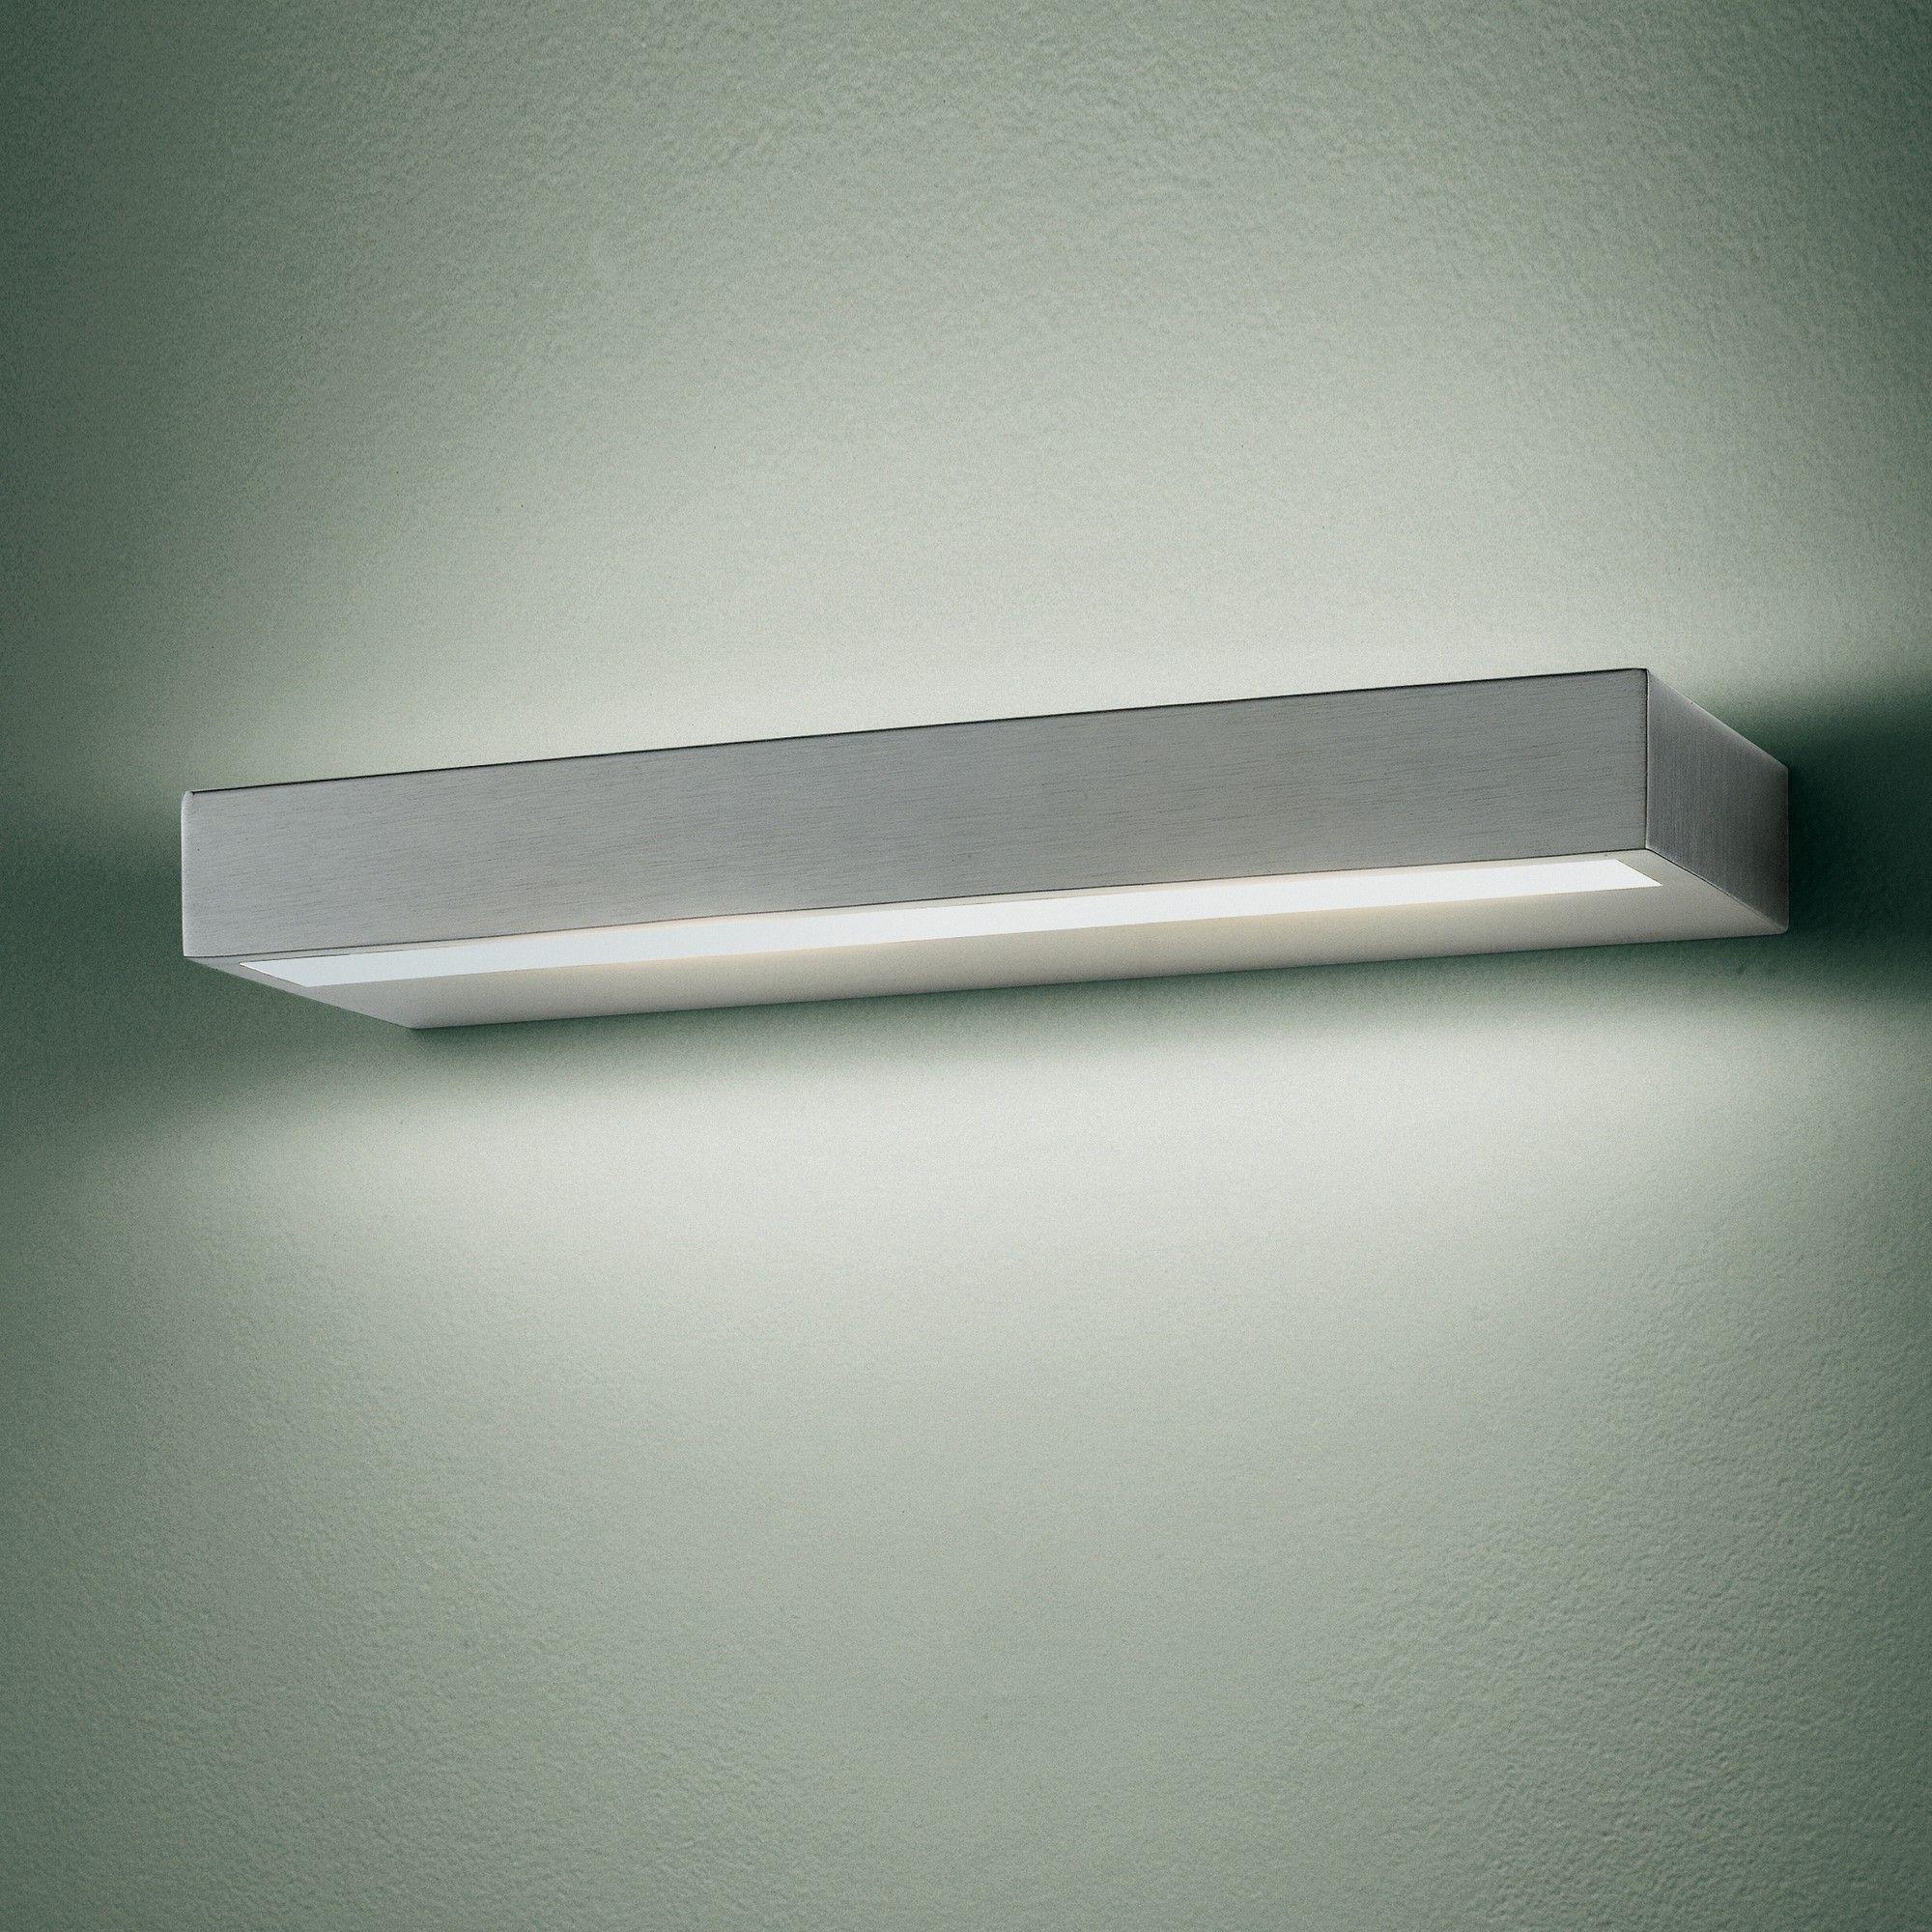 itre lighting. Itre Alias 15/30 Wall Lamp | AllModern Lighting